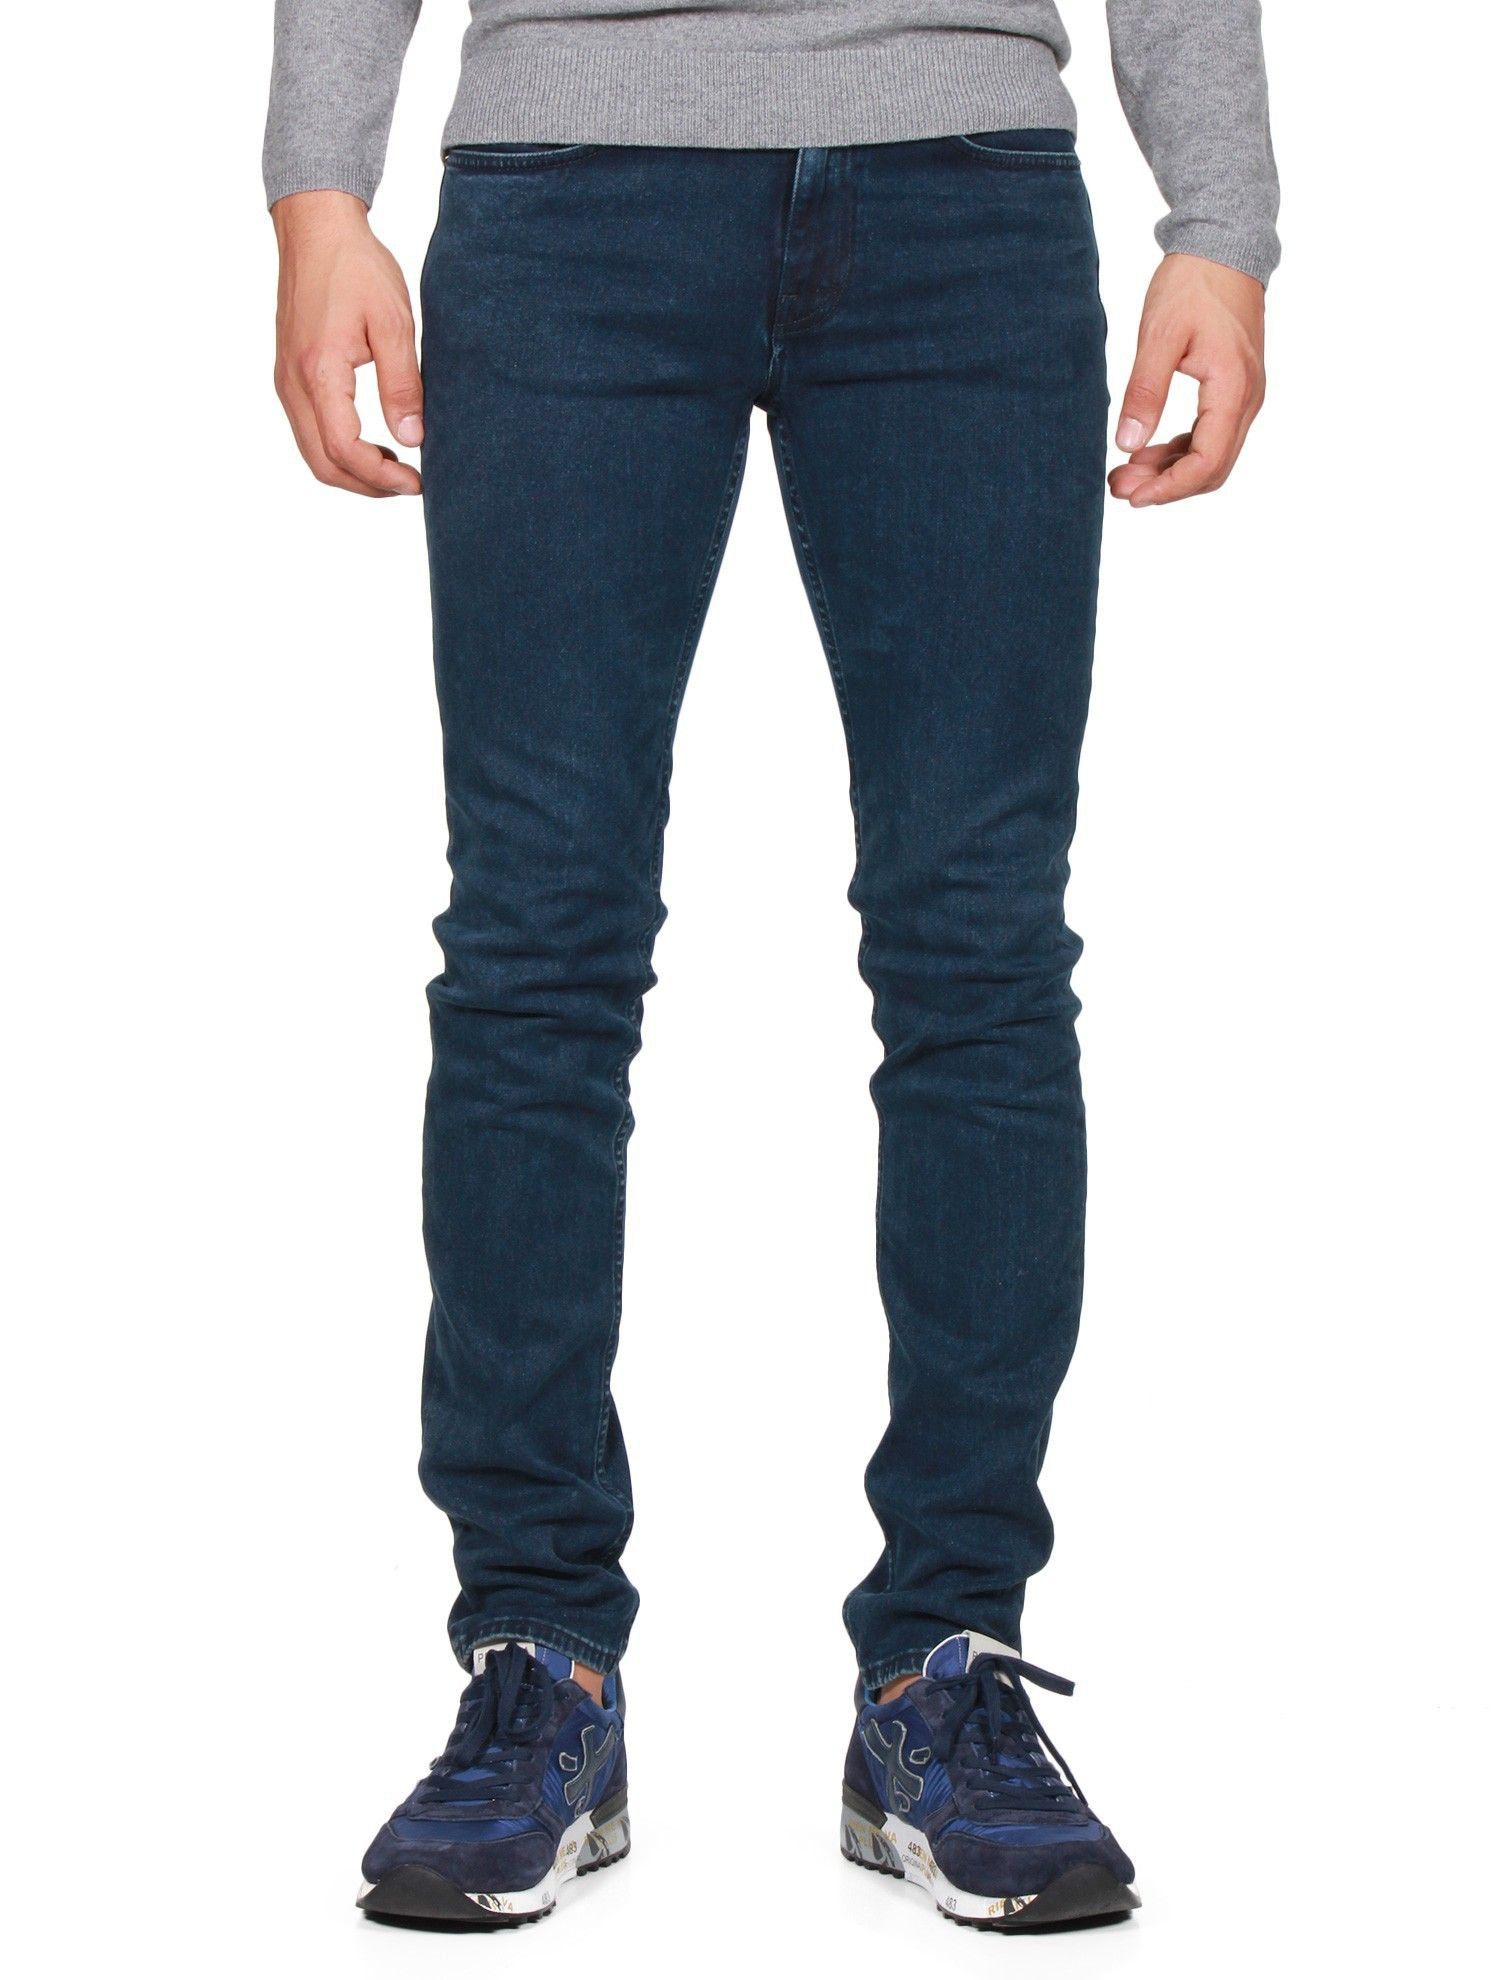 0bb4141df92 Pantalon Homme - Jean  Ace Abyss  ACNE STUDIOS - Bleu - serie ...